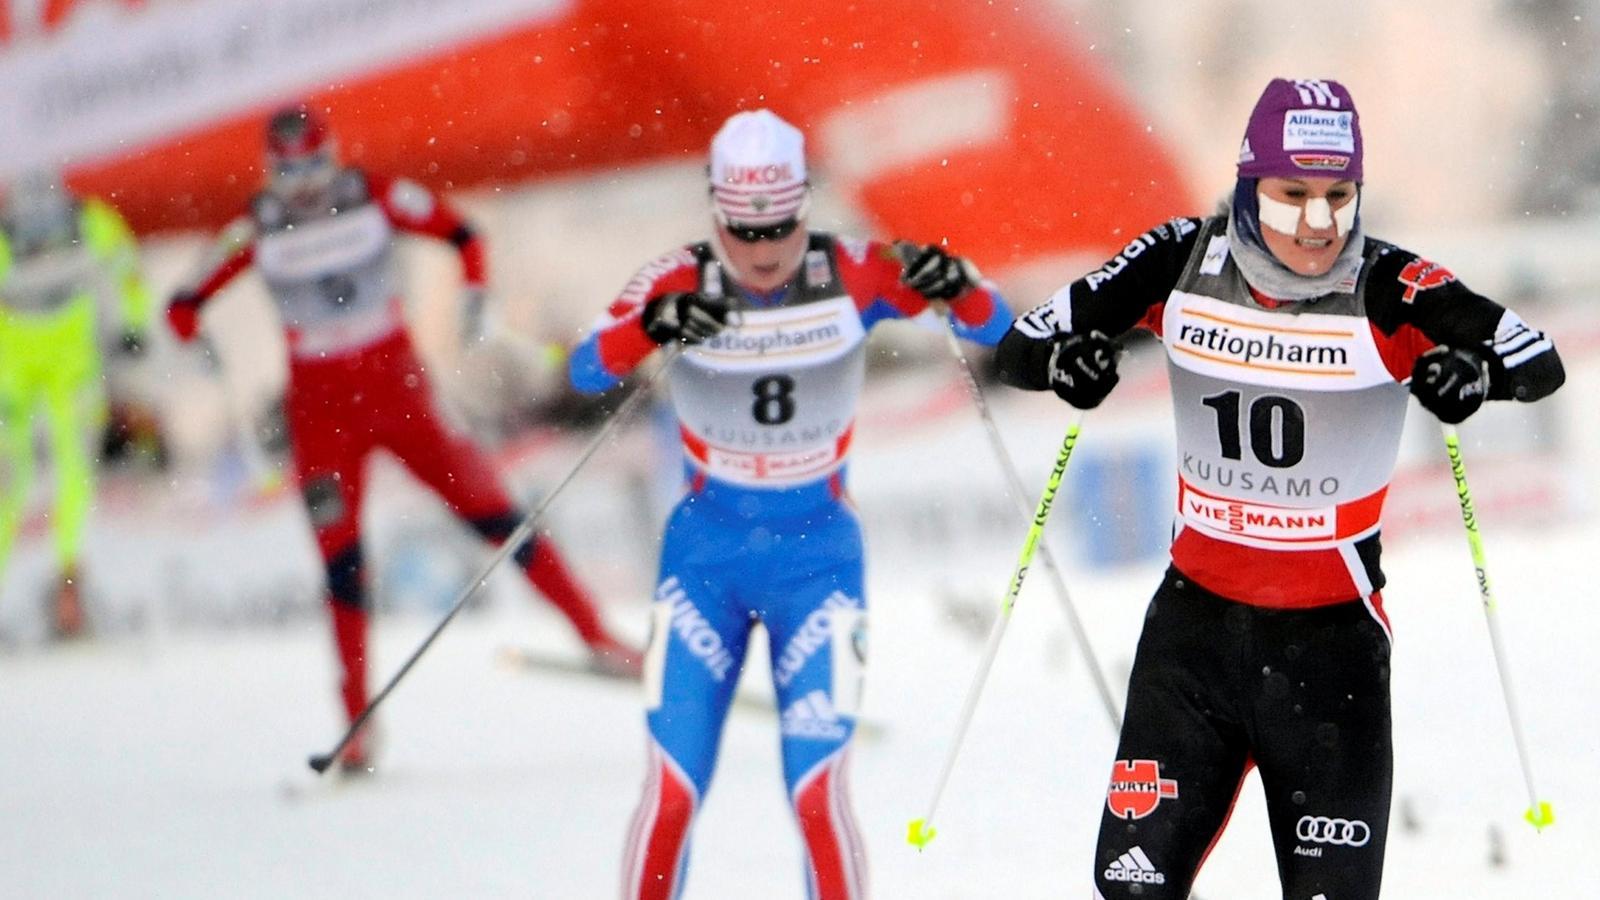 Tchekaleva wins first World Cup event in Rybinsk skiathlon - Eurosport